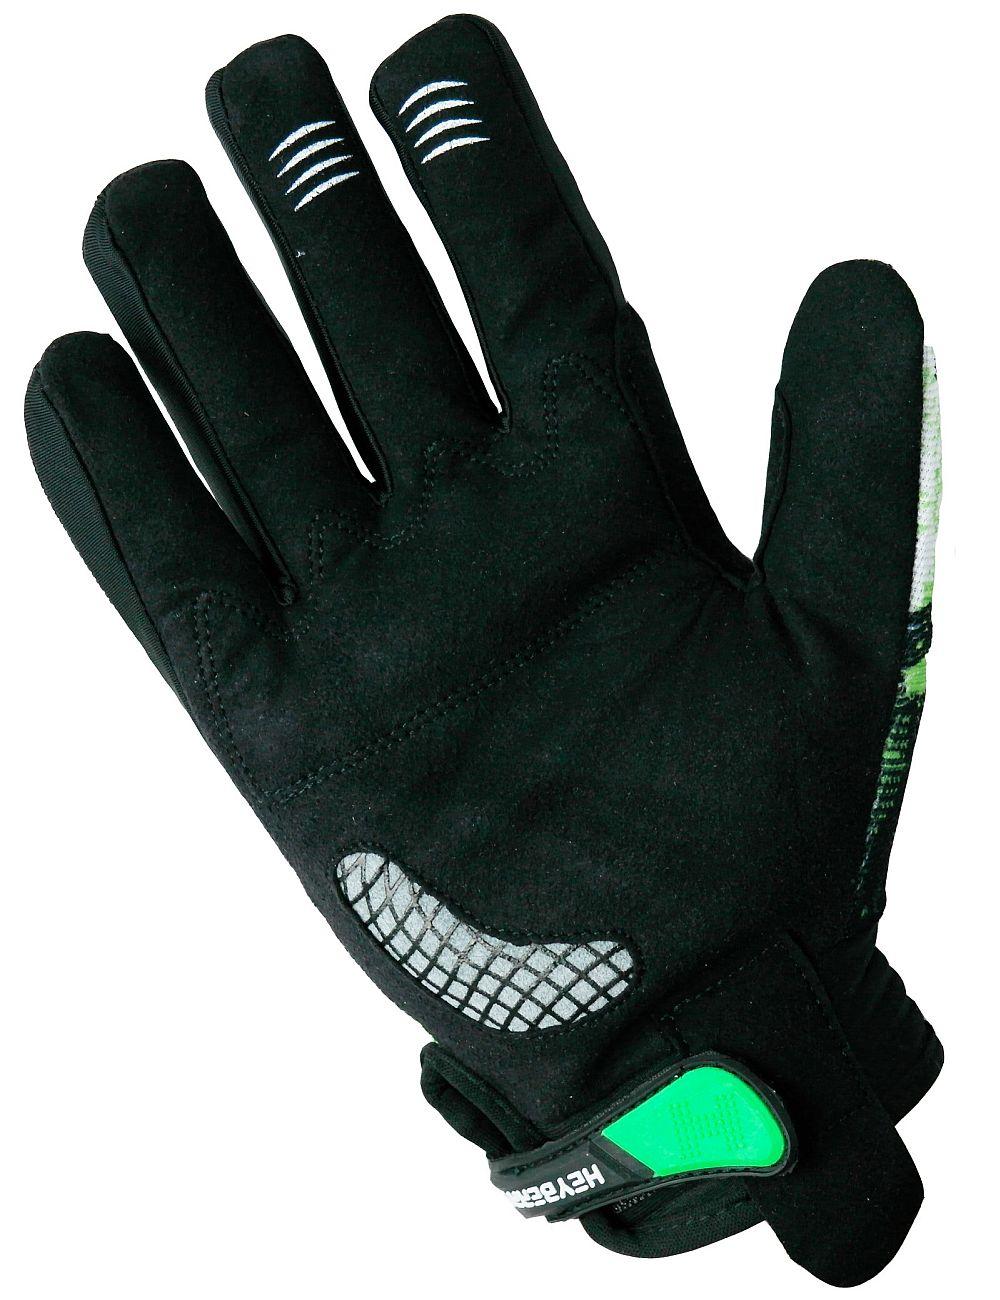 Heyberry Motocross MX Handschuhe schwarz weiß grün Gr. S - XXL